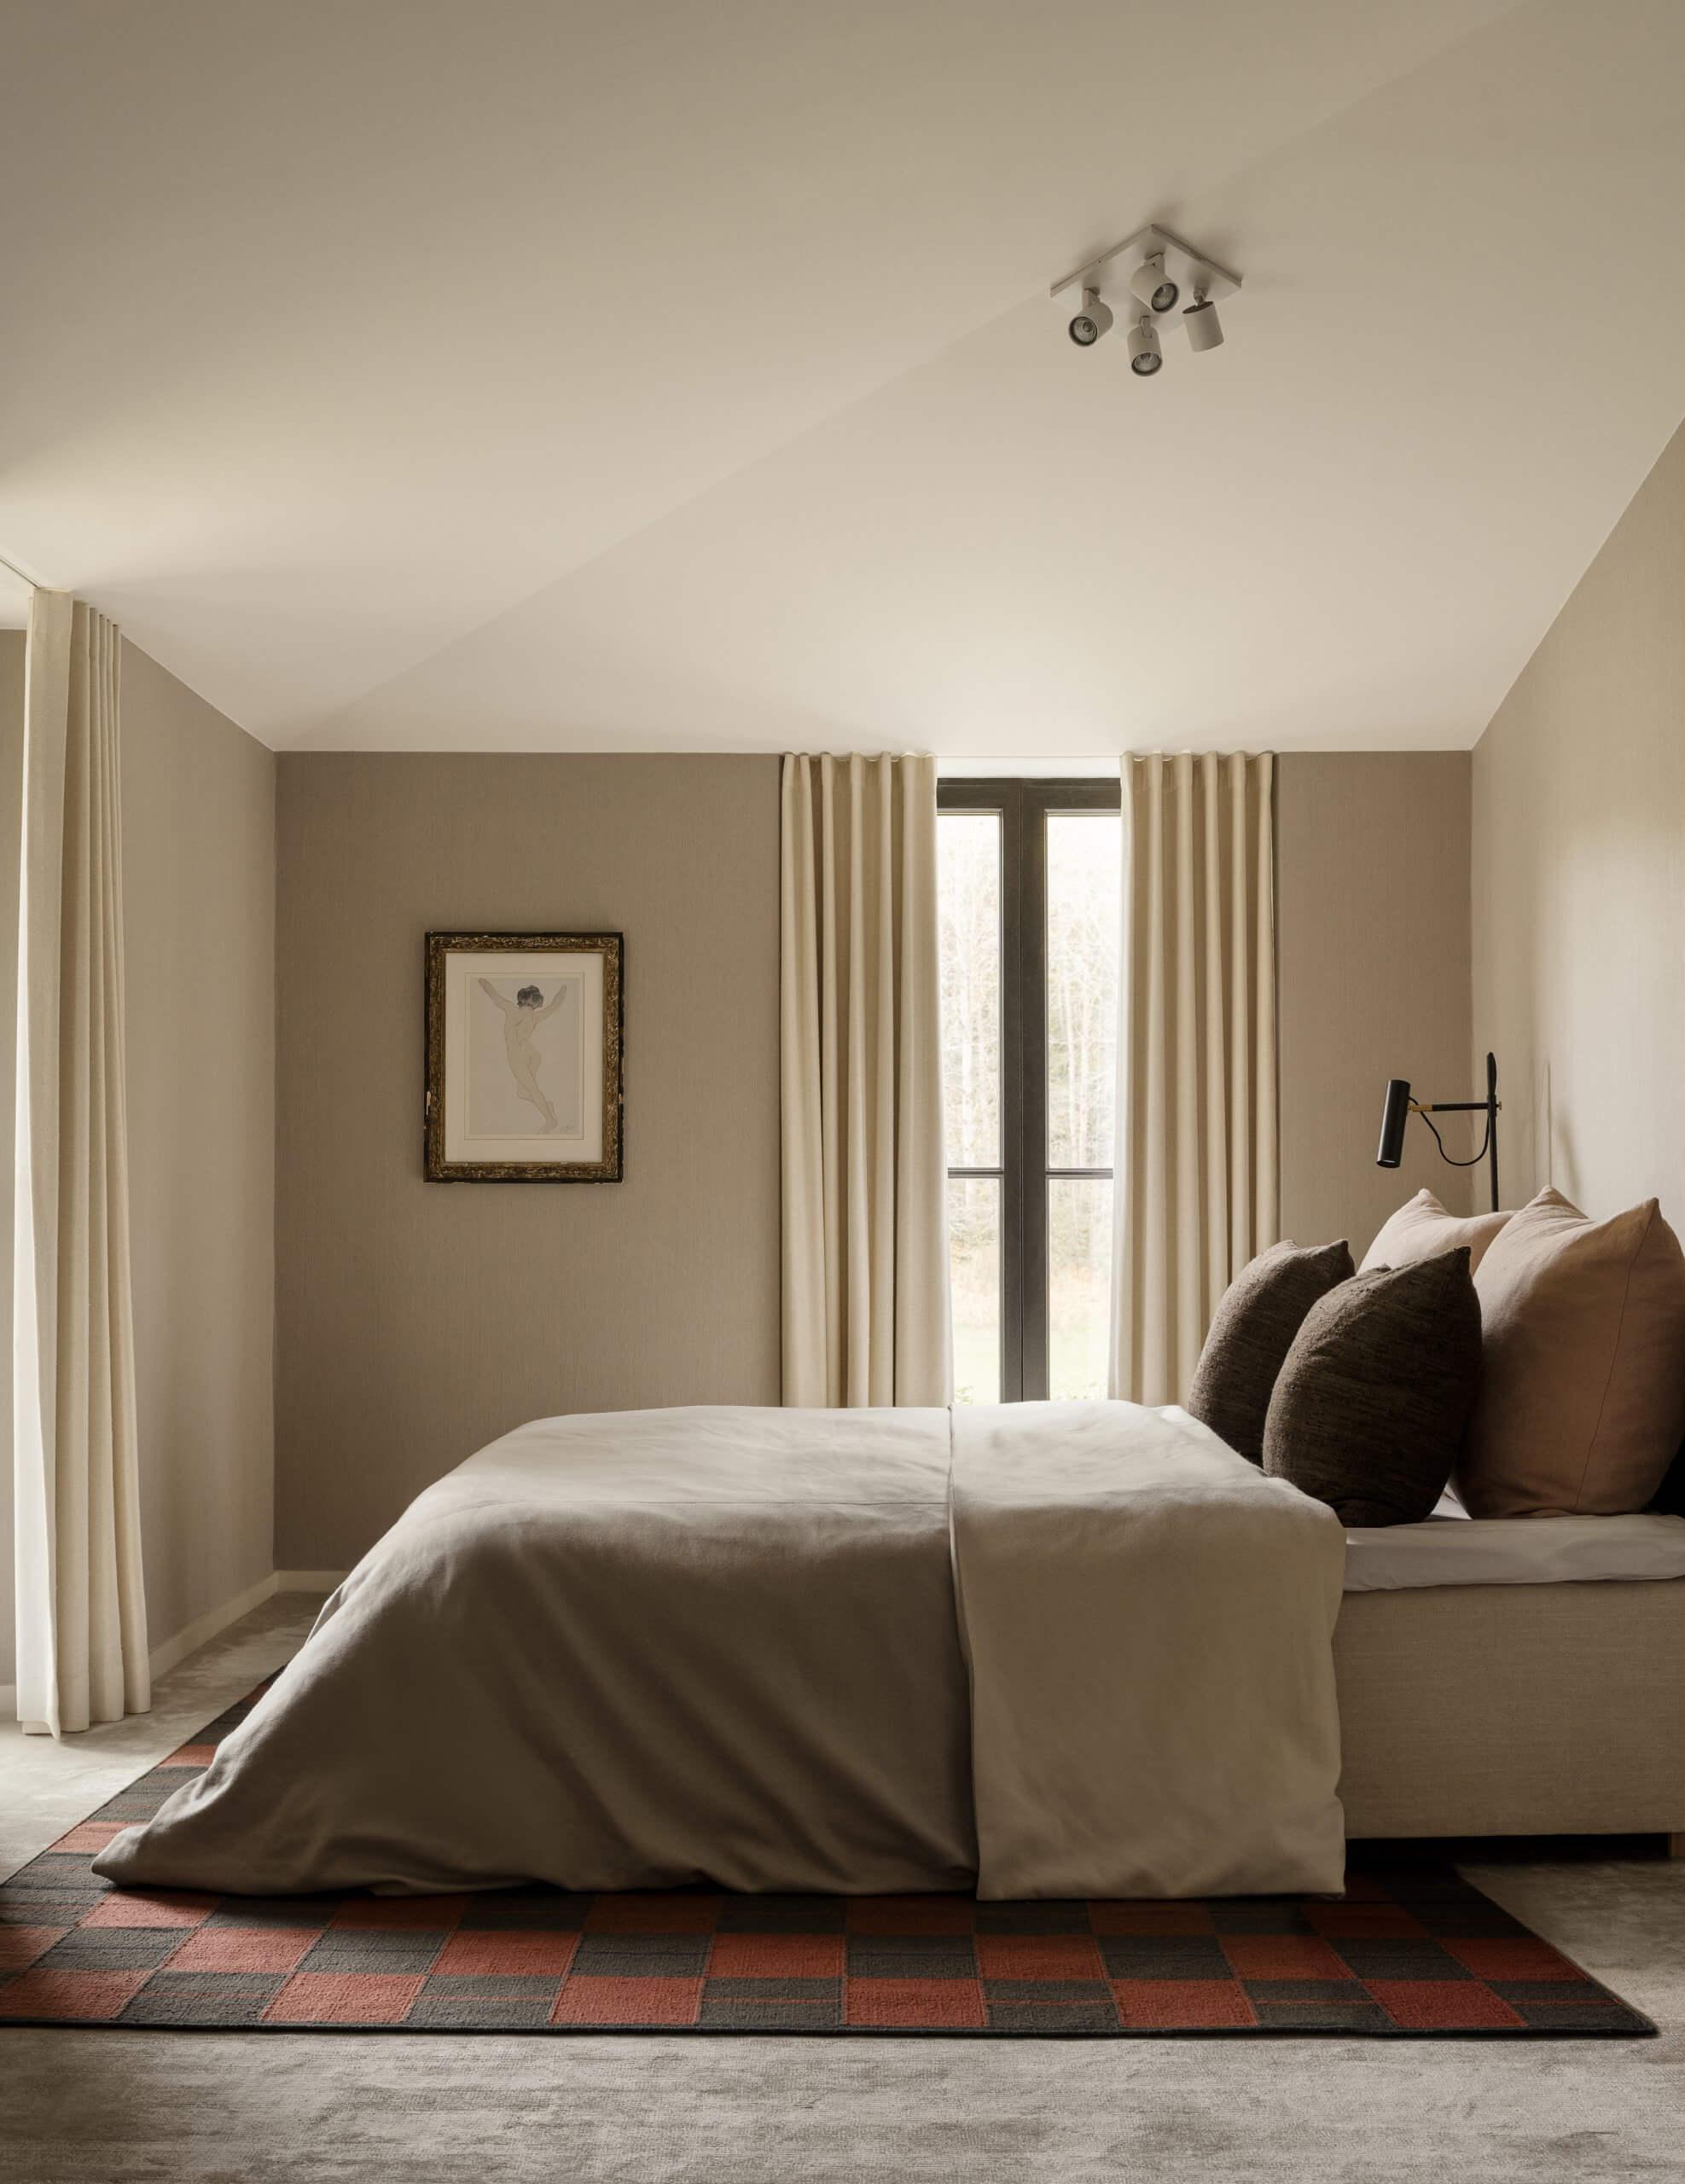 The Båstad flatweave rug in Red, in a beautiful warm beige bedroom.